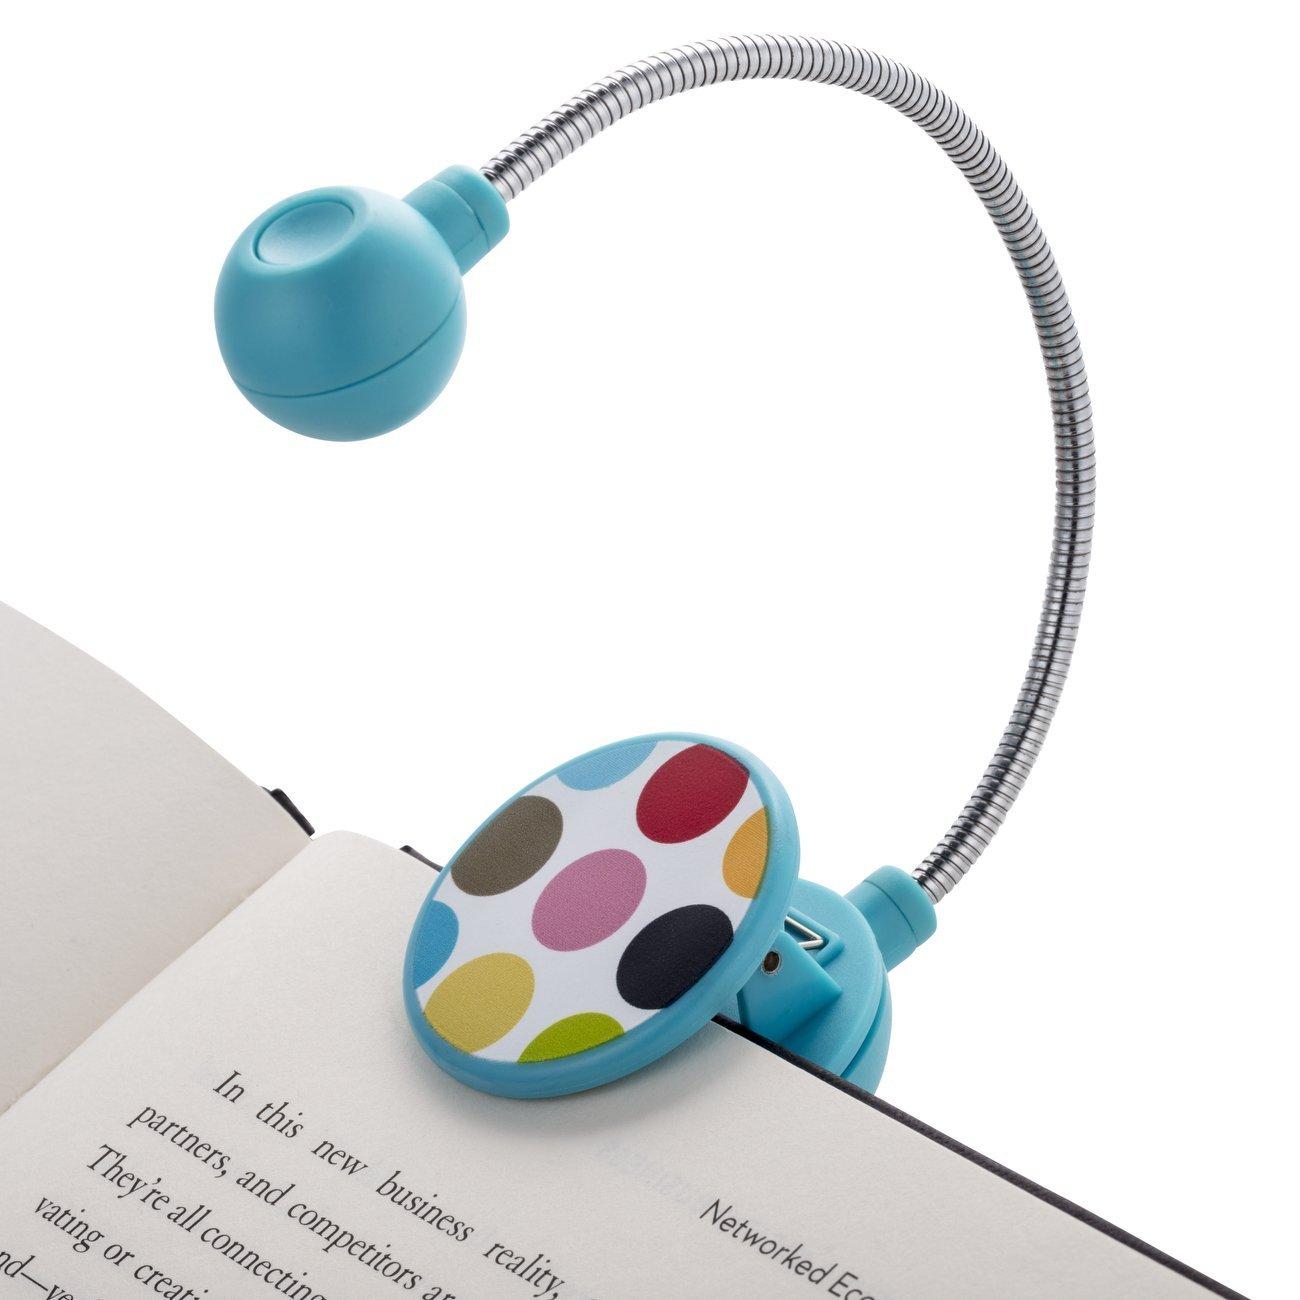 LED Book Light by French Bull - LED Book Light - Book Reading Light - LED Reading Light … (Maya)